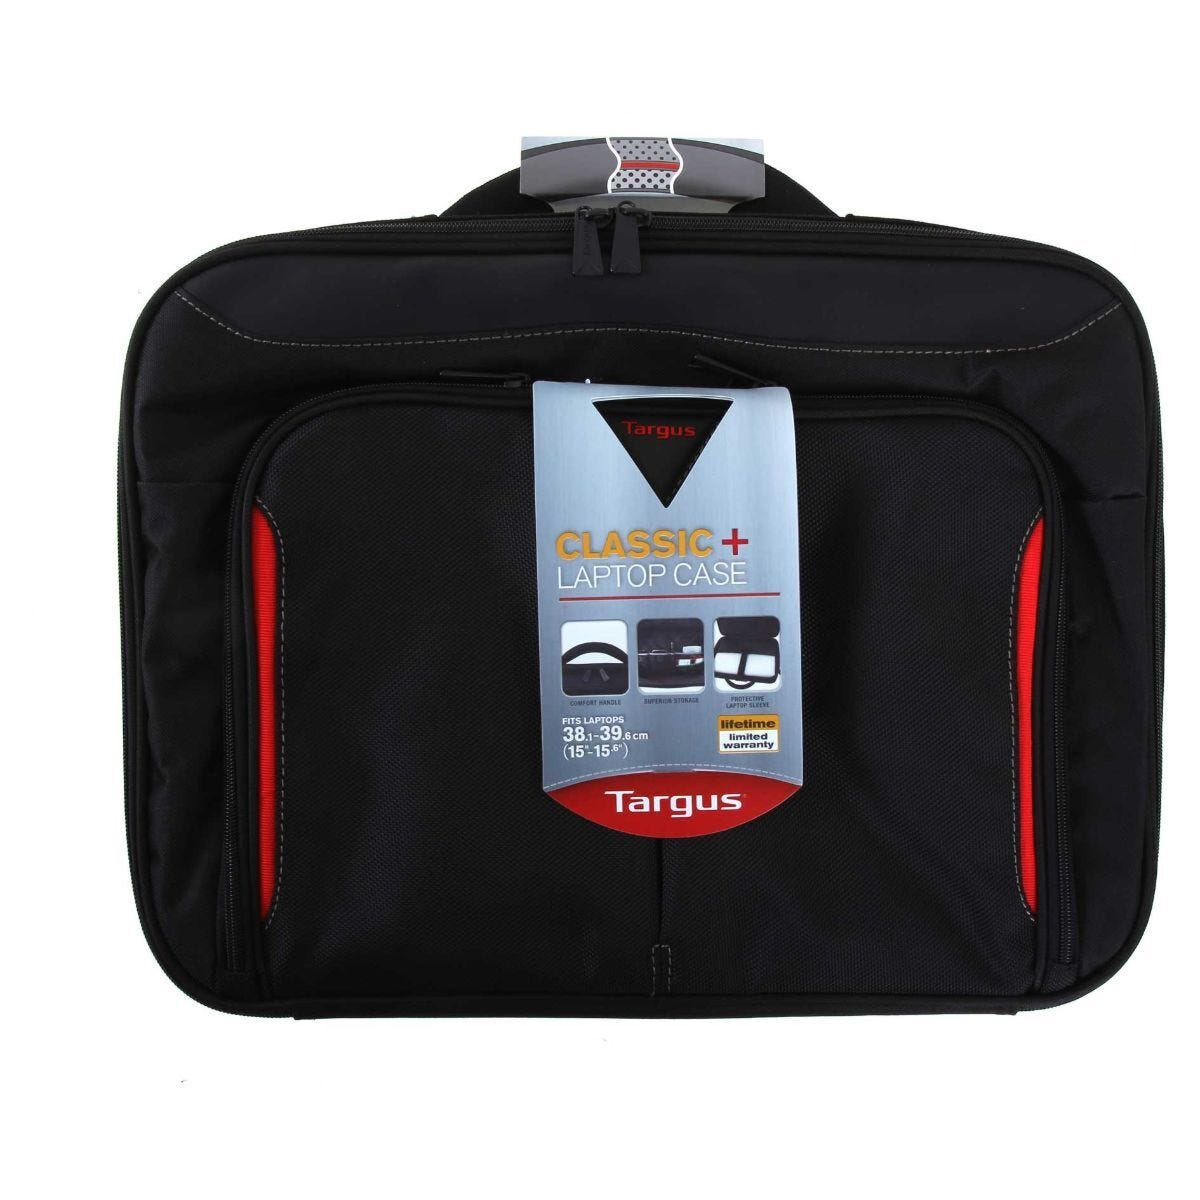 Targus Classic Plus Clamshell Laptop Bag 15-15.6 Inch